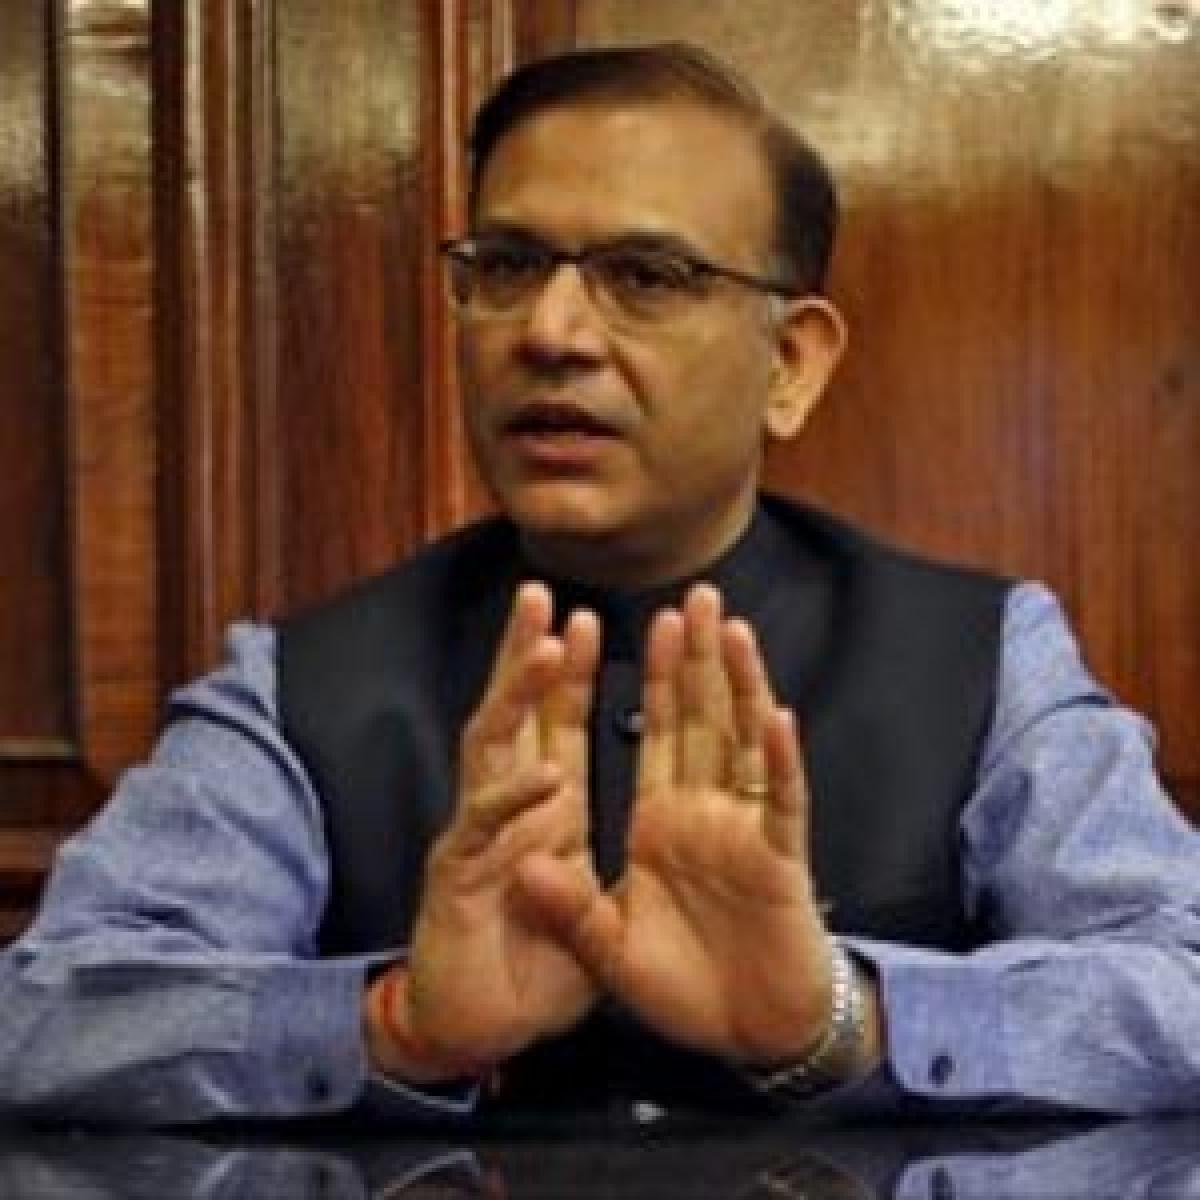 Govt plans to privatise IDBI Bank: Jayant Sinha